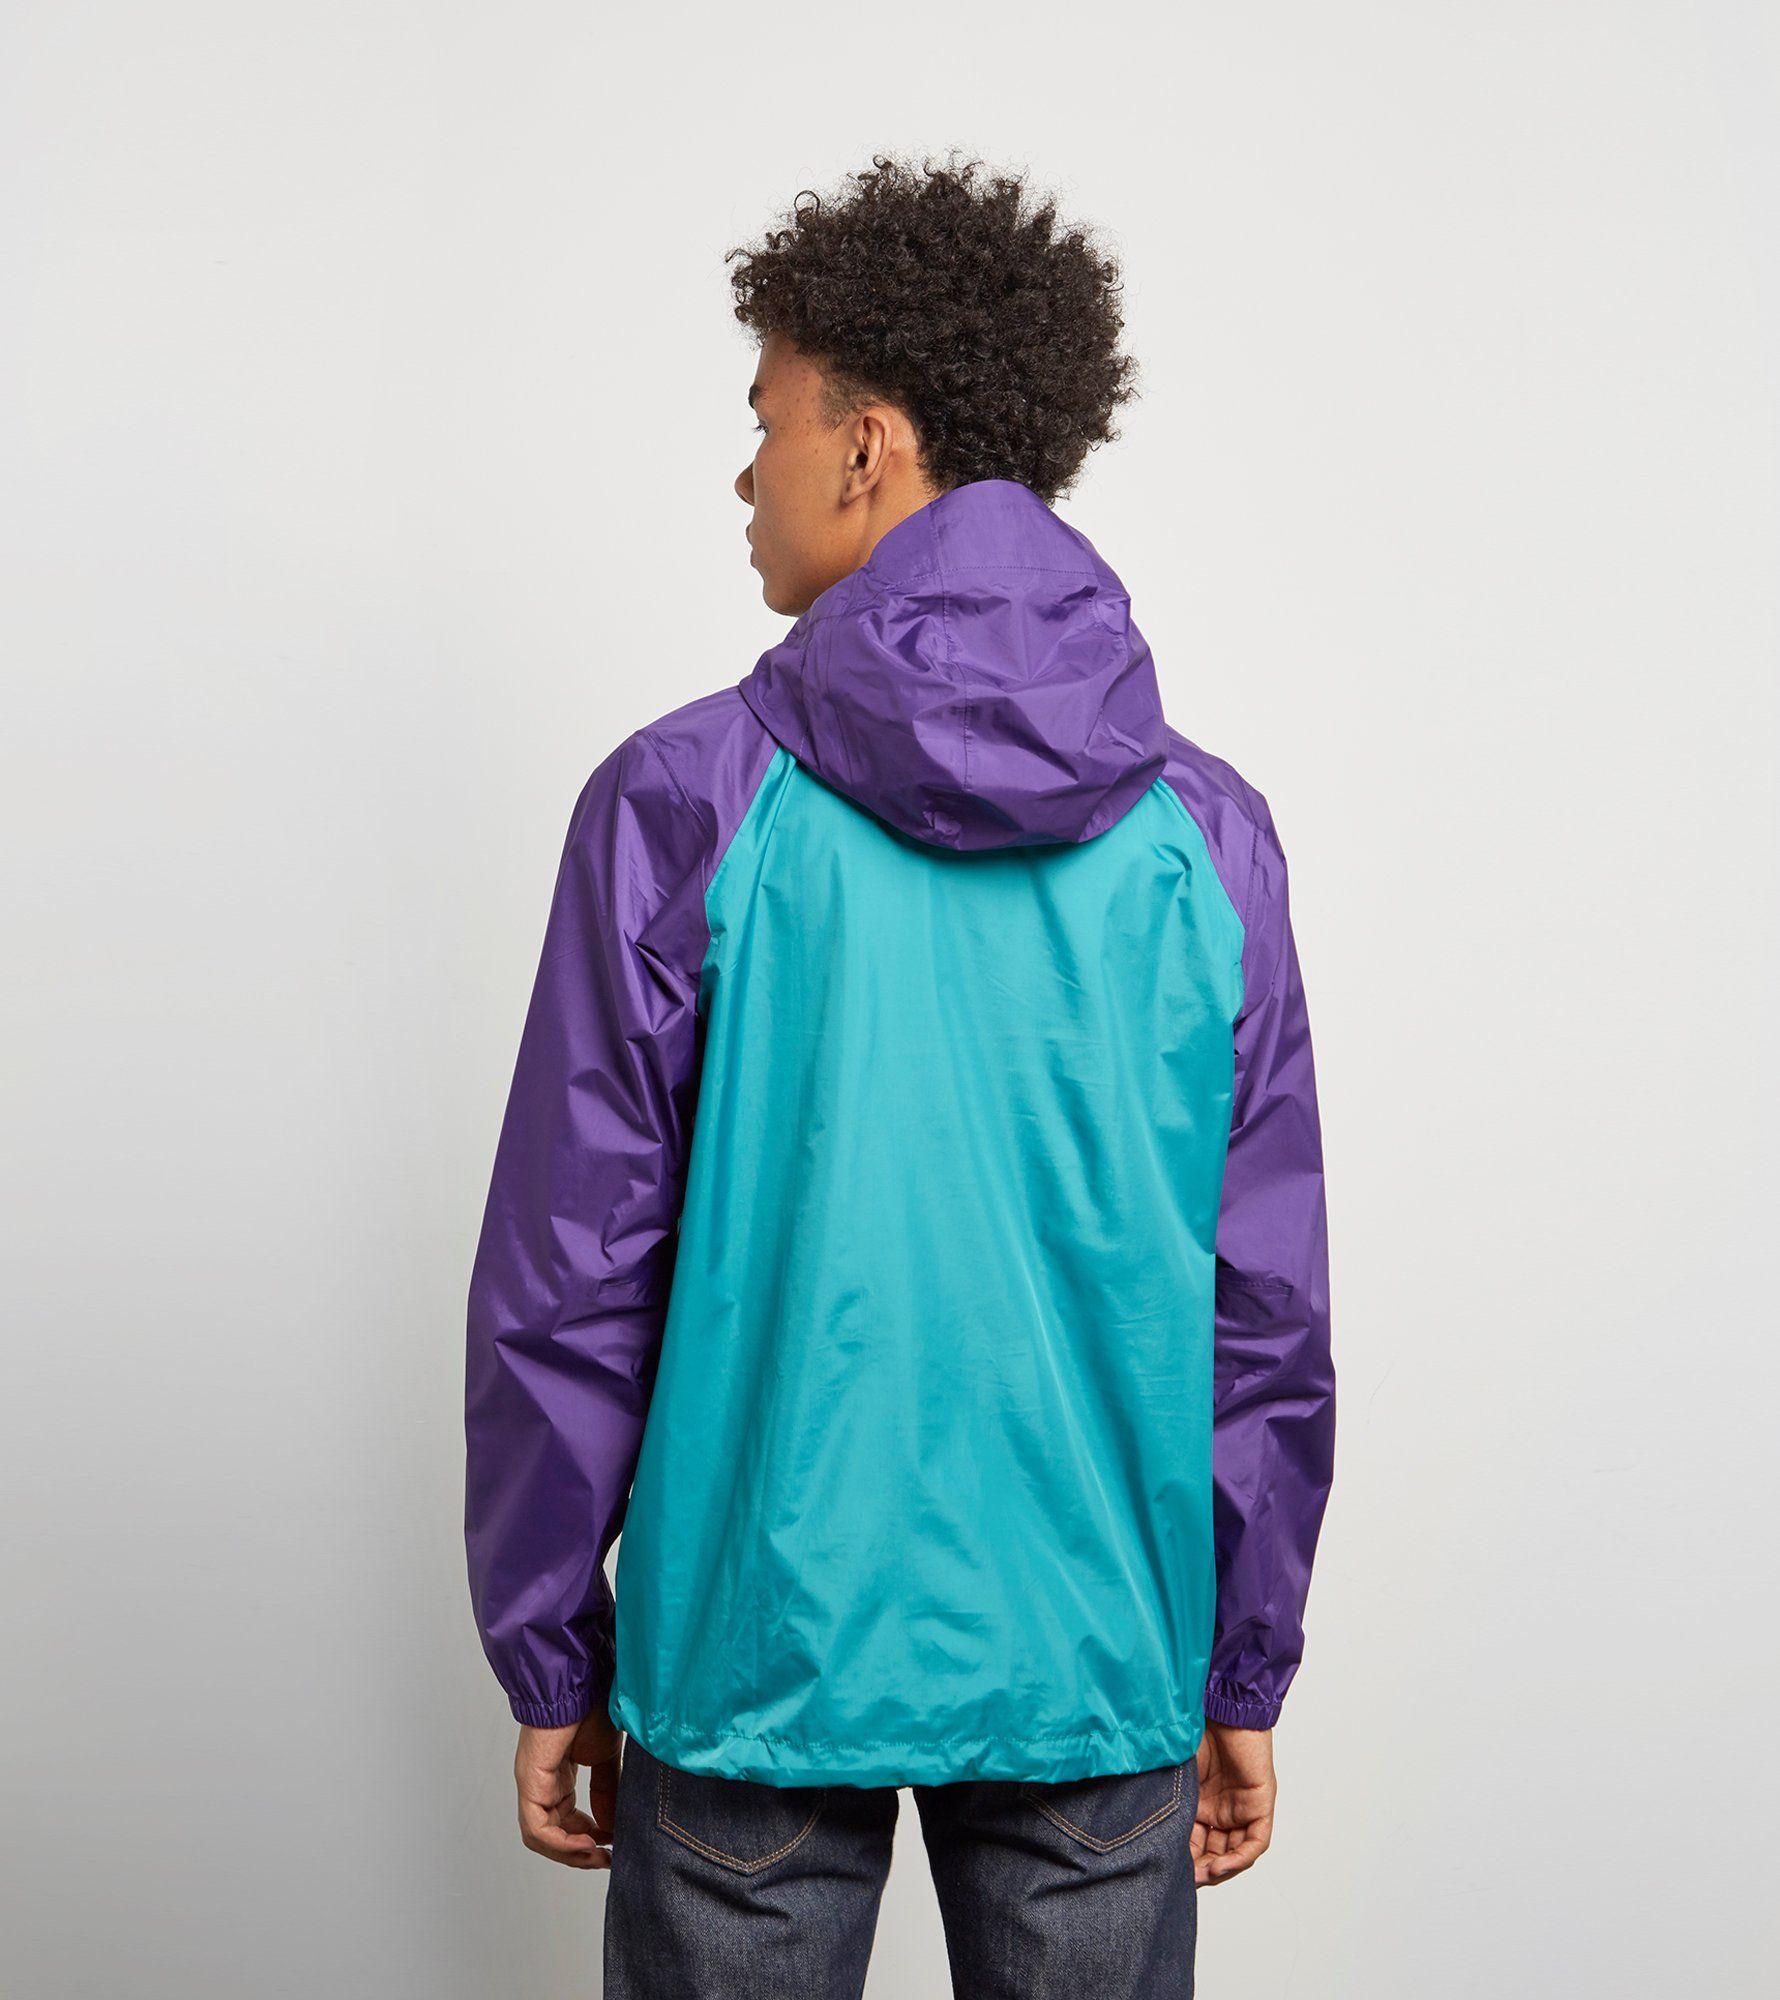 Patagonia Torrentshell Half-Zip Jacket